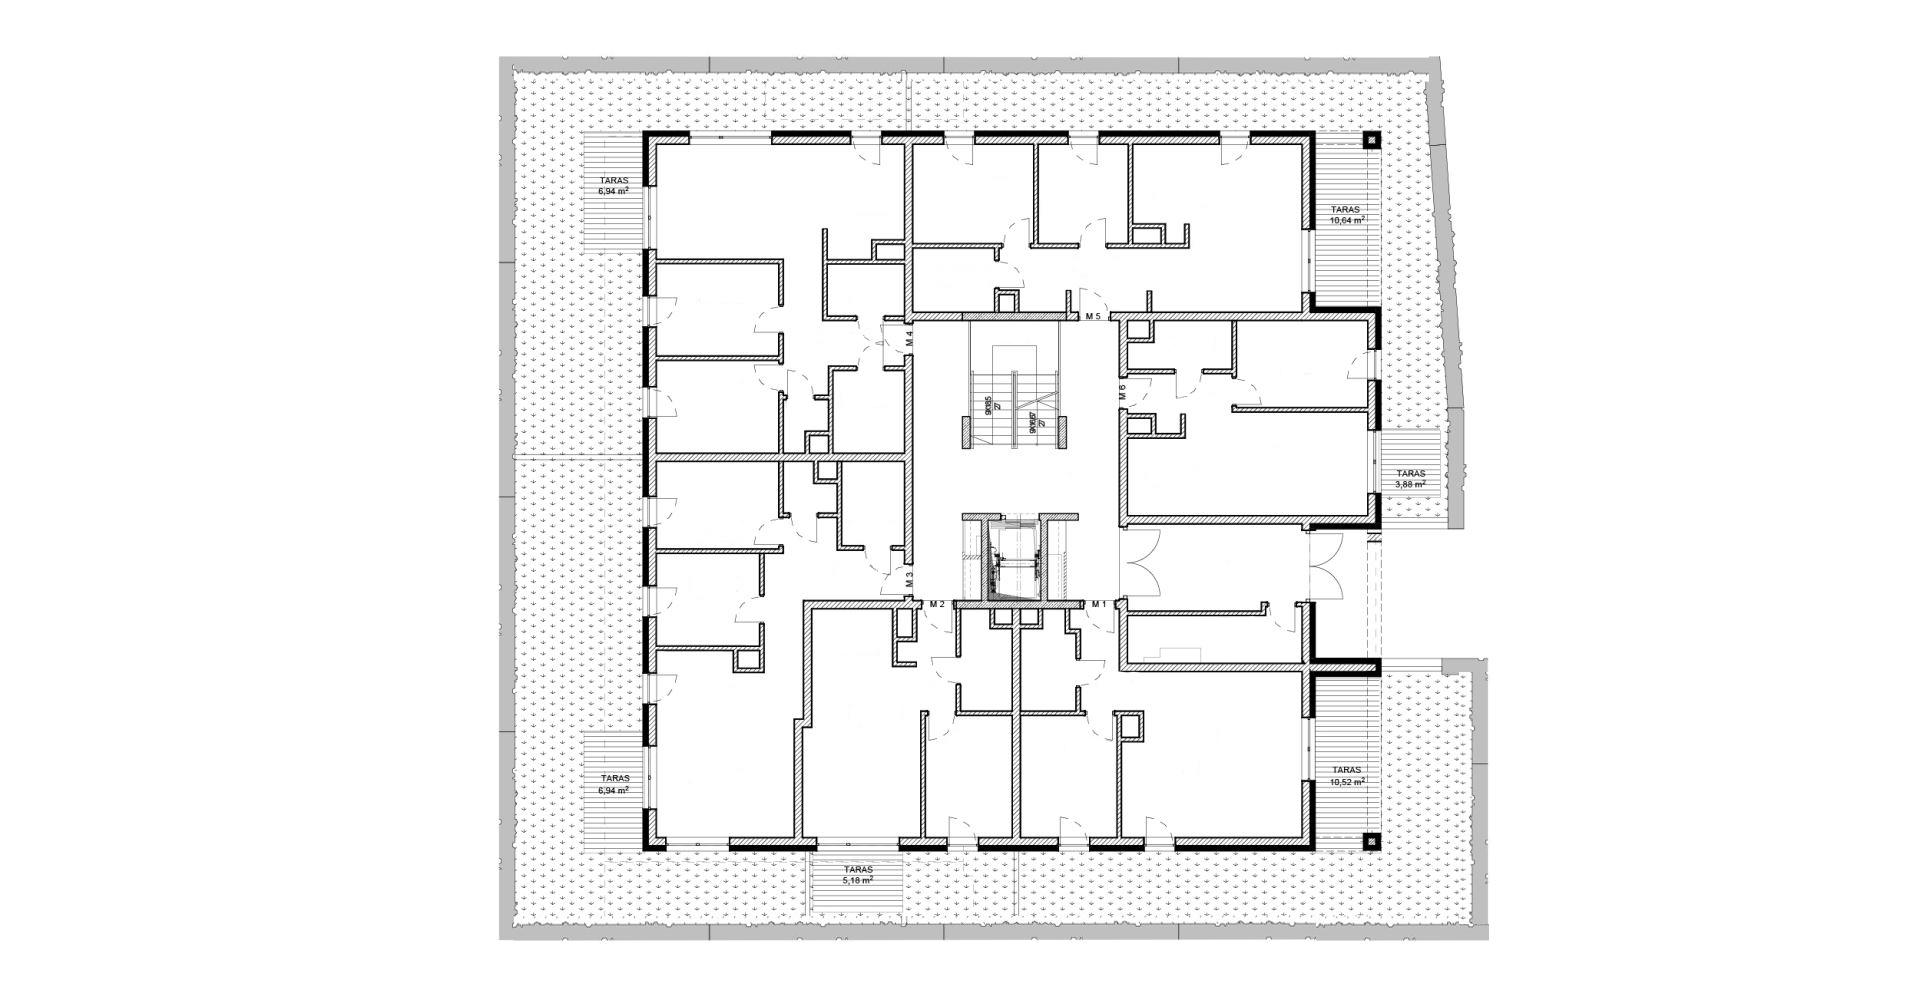 Budynek B Piętro 0